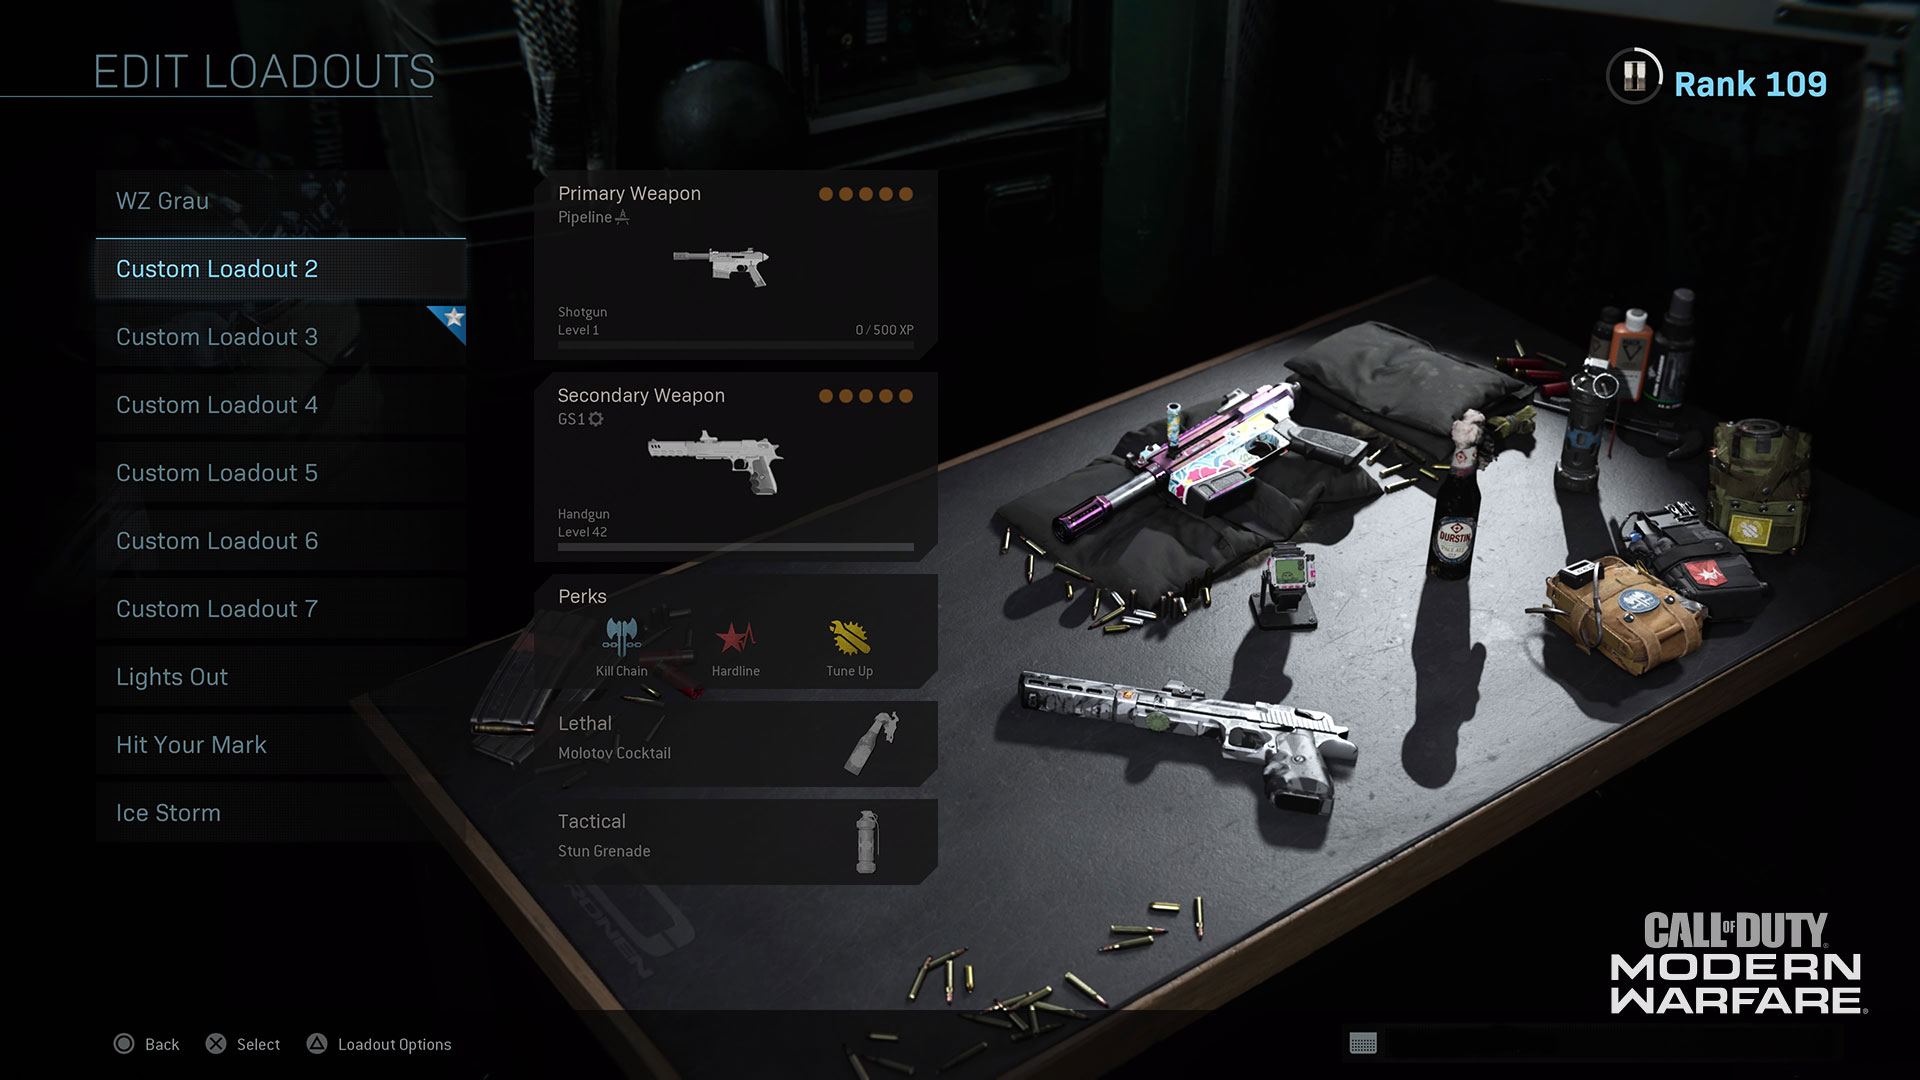 Introducing: The VLK Rogue Shotgun - Image 1